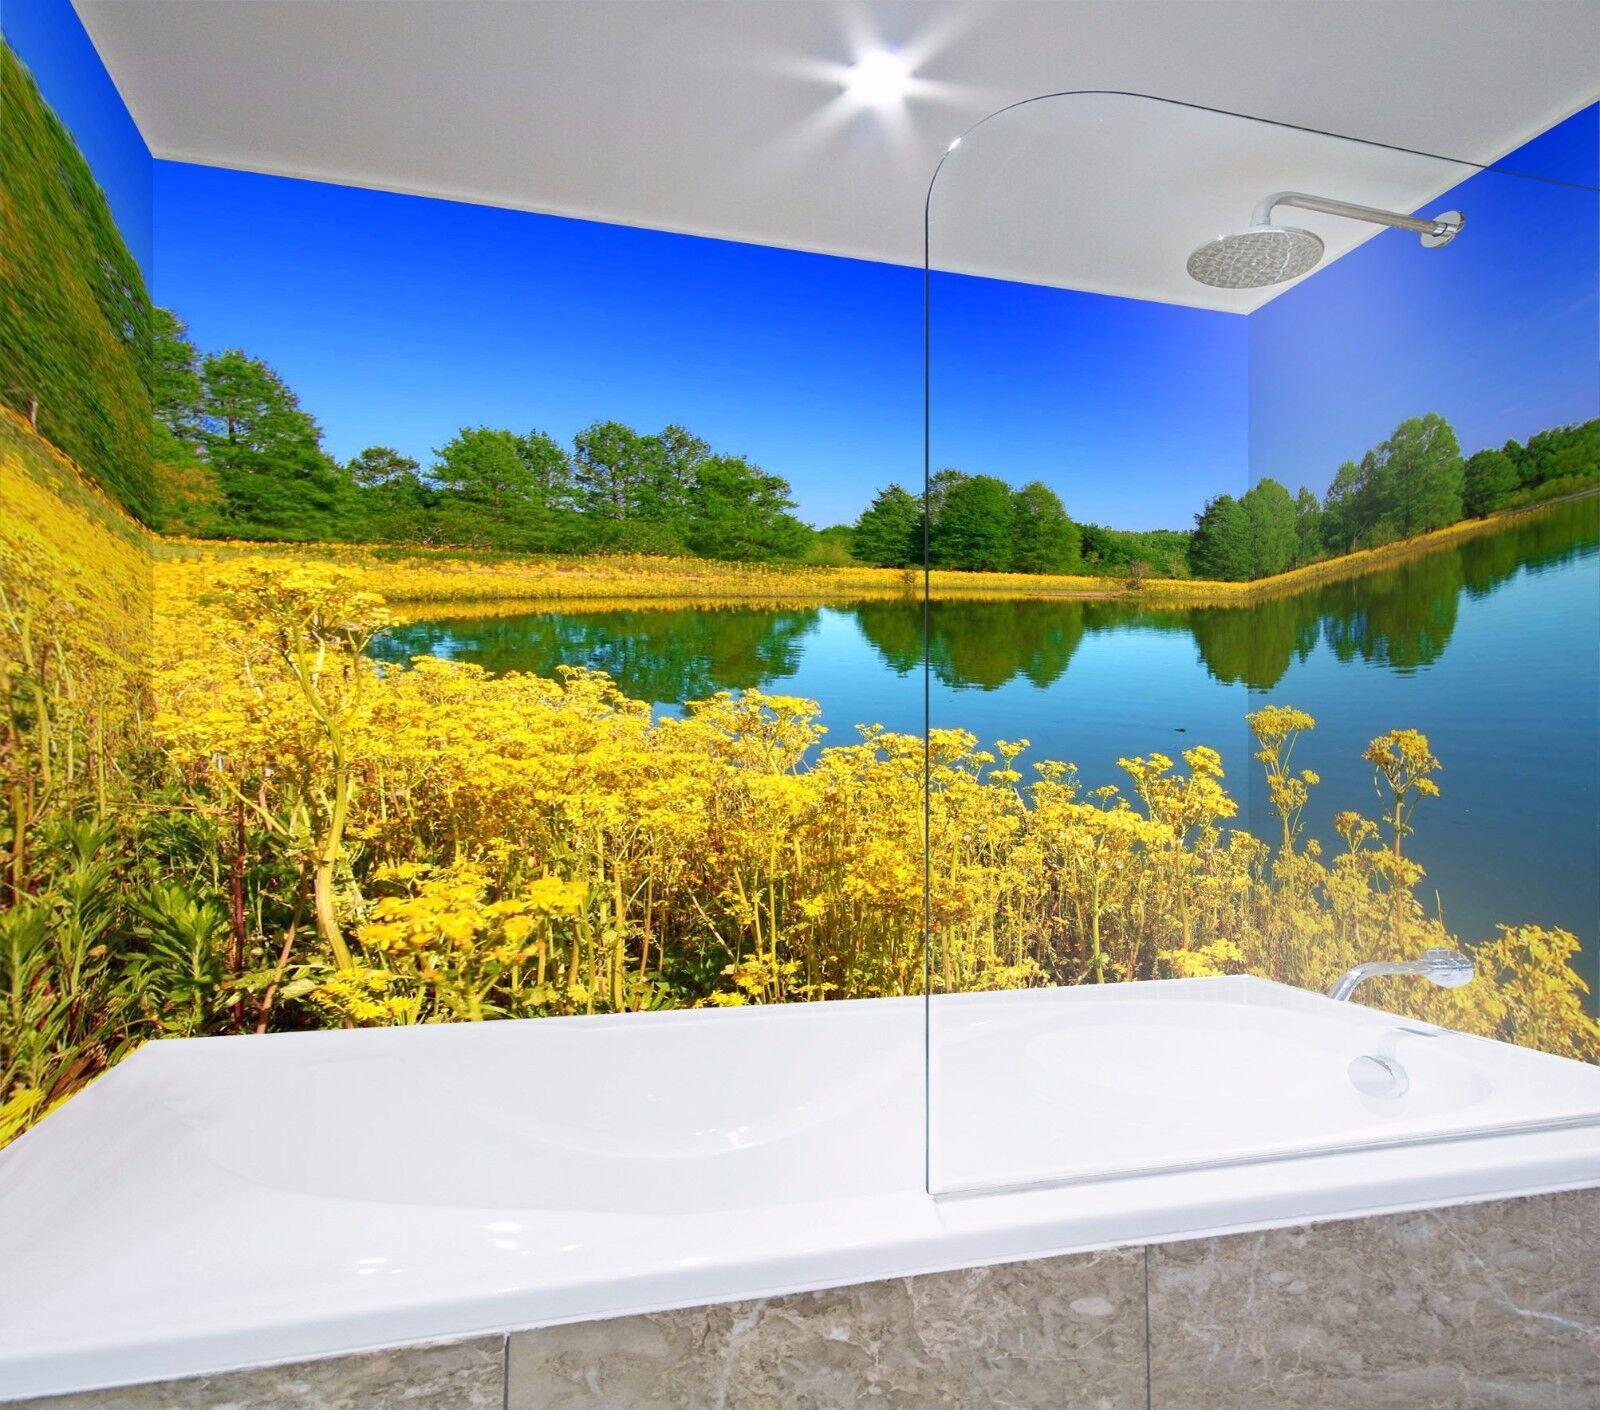 3D Rape Flowers 544 WallPaper Bathroom Print Decal Wall Deco AJ WALLPAPER AU